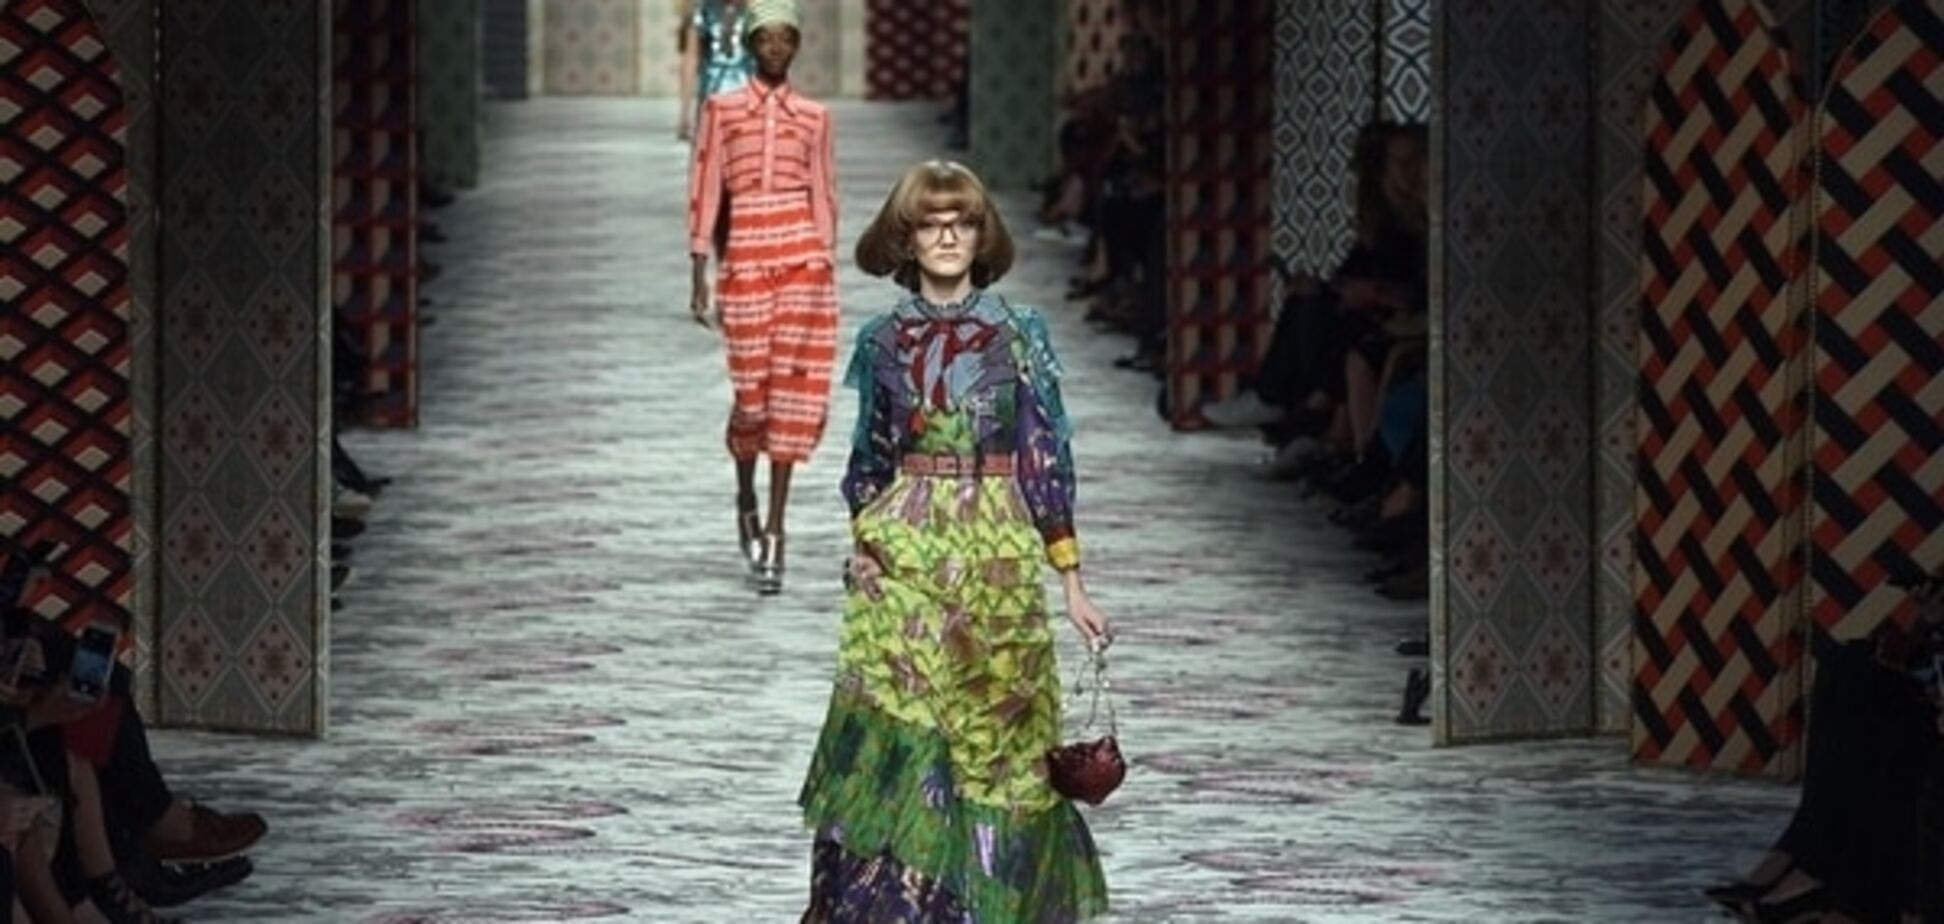 Зов джунглей: яркий показ Gucci на Неделе моды в Милане